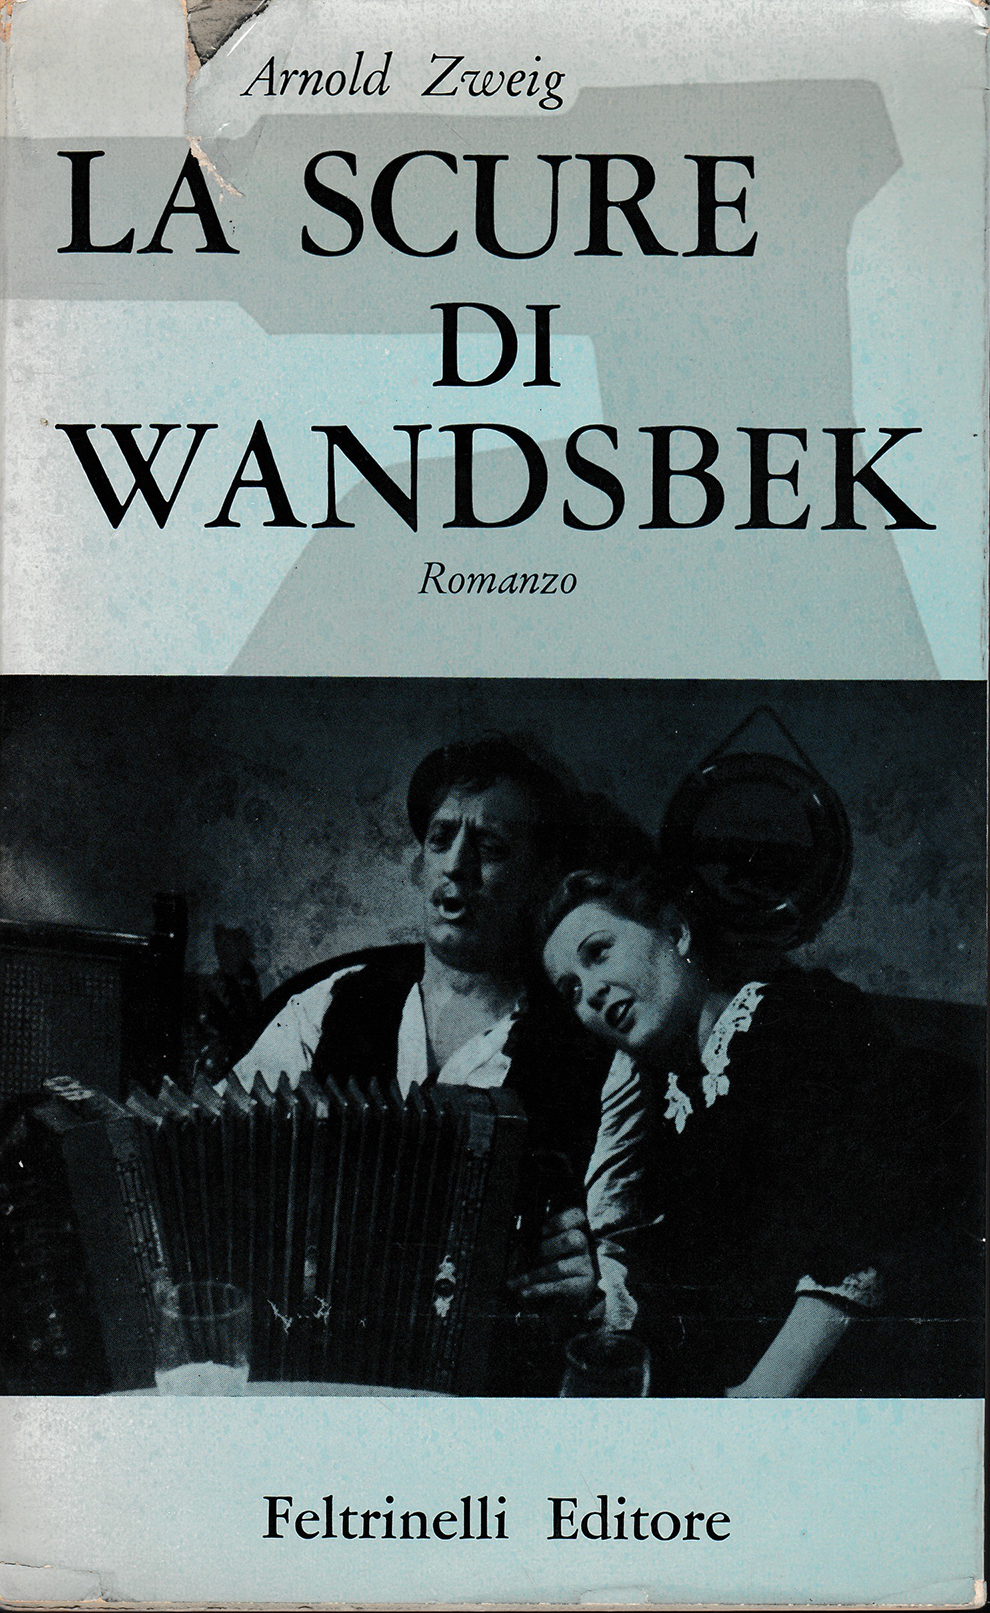 La scure di Wandsbek